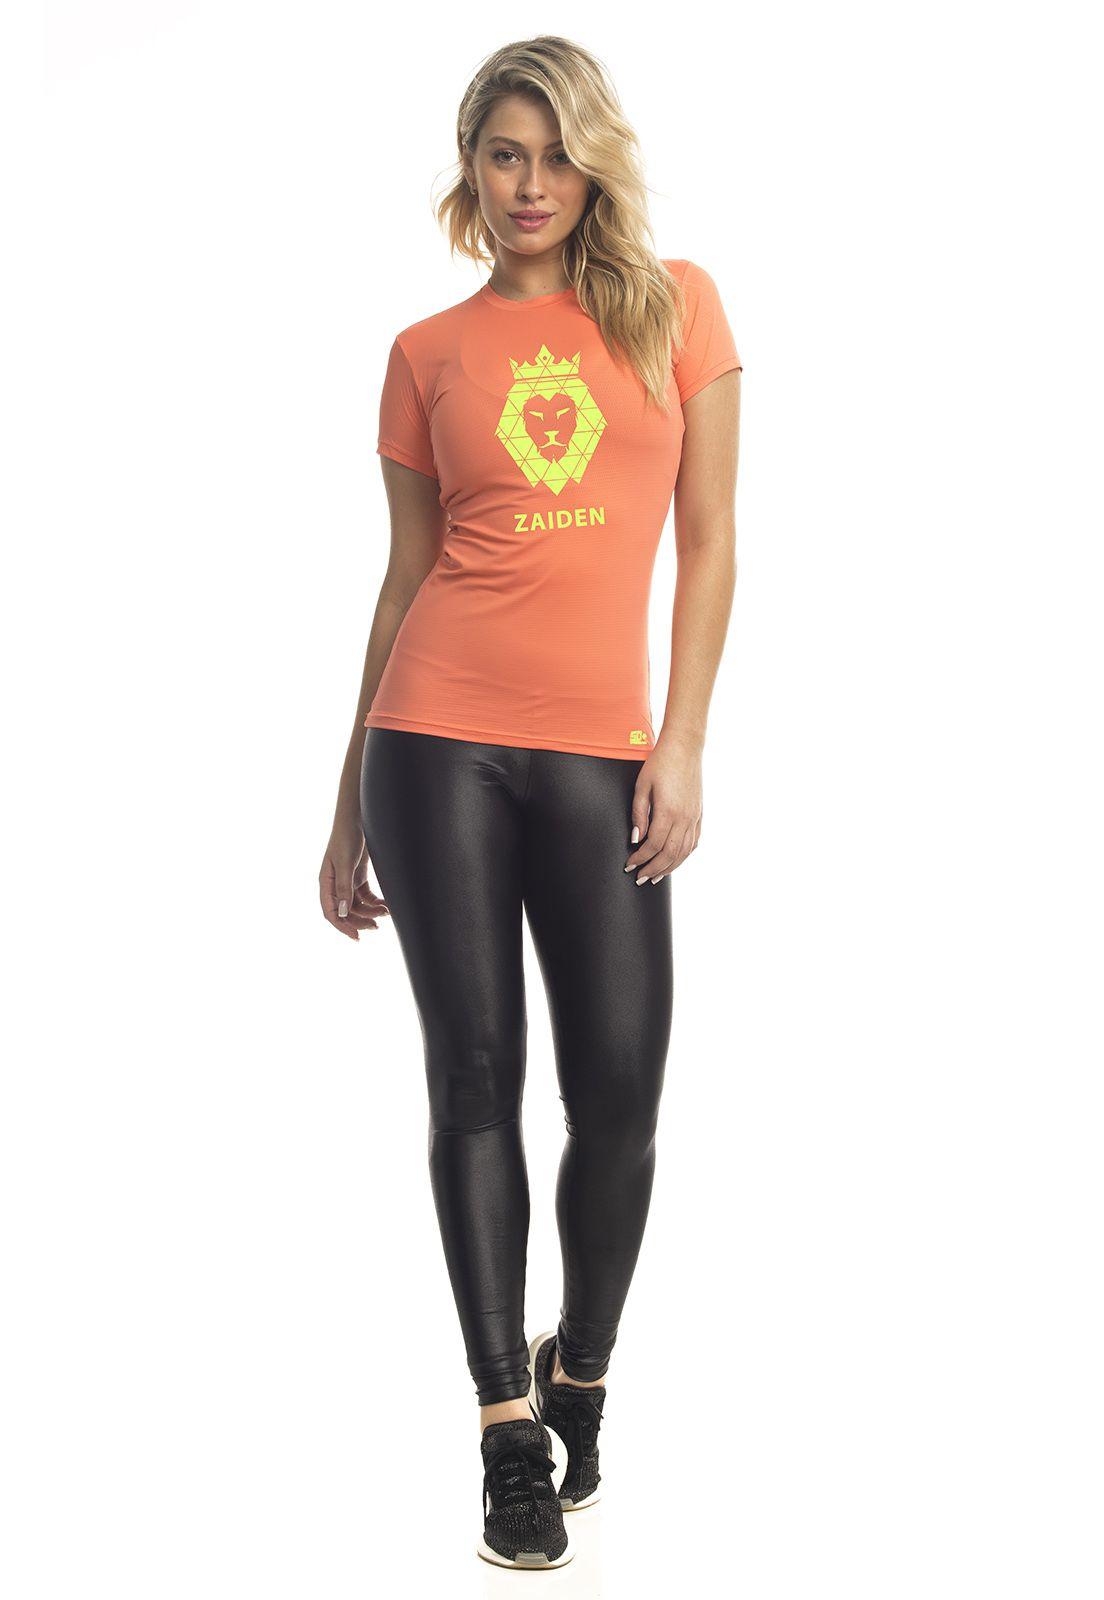 Camiseta Feminina Poliamida ZAIDEN Rambla Leão Amarelo Neon